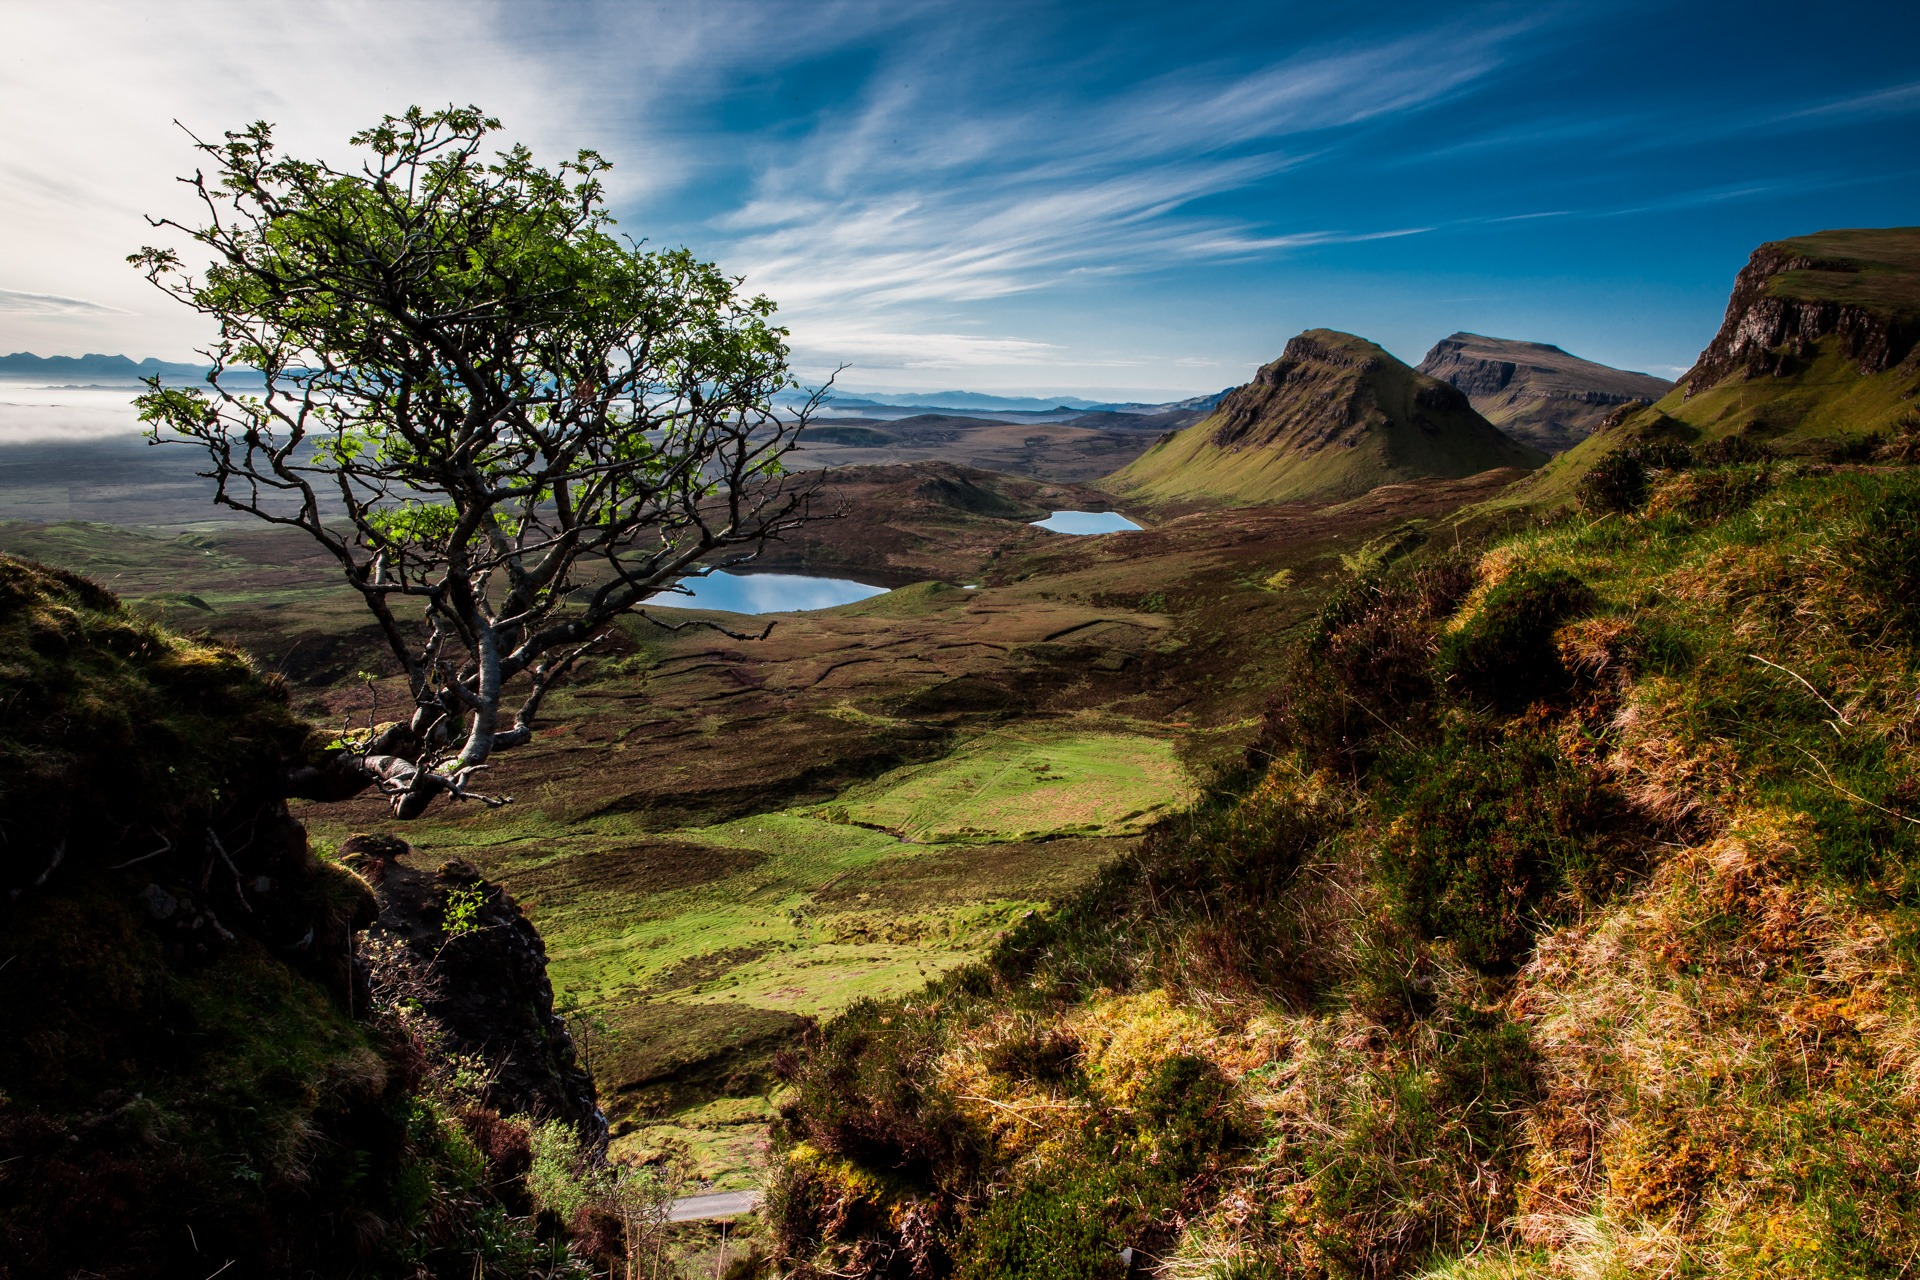 terre nature paysage alaska nature - photo #20